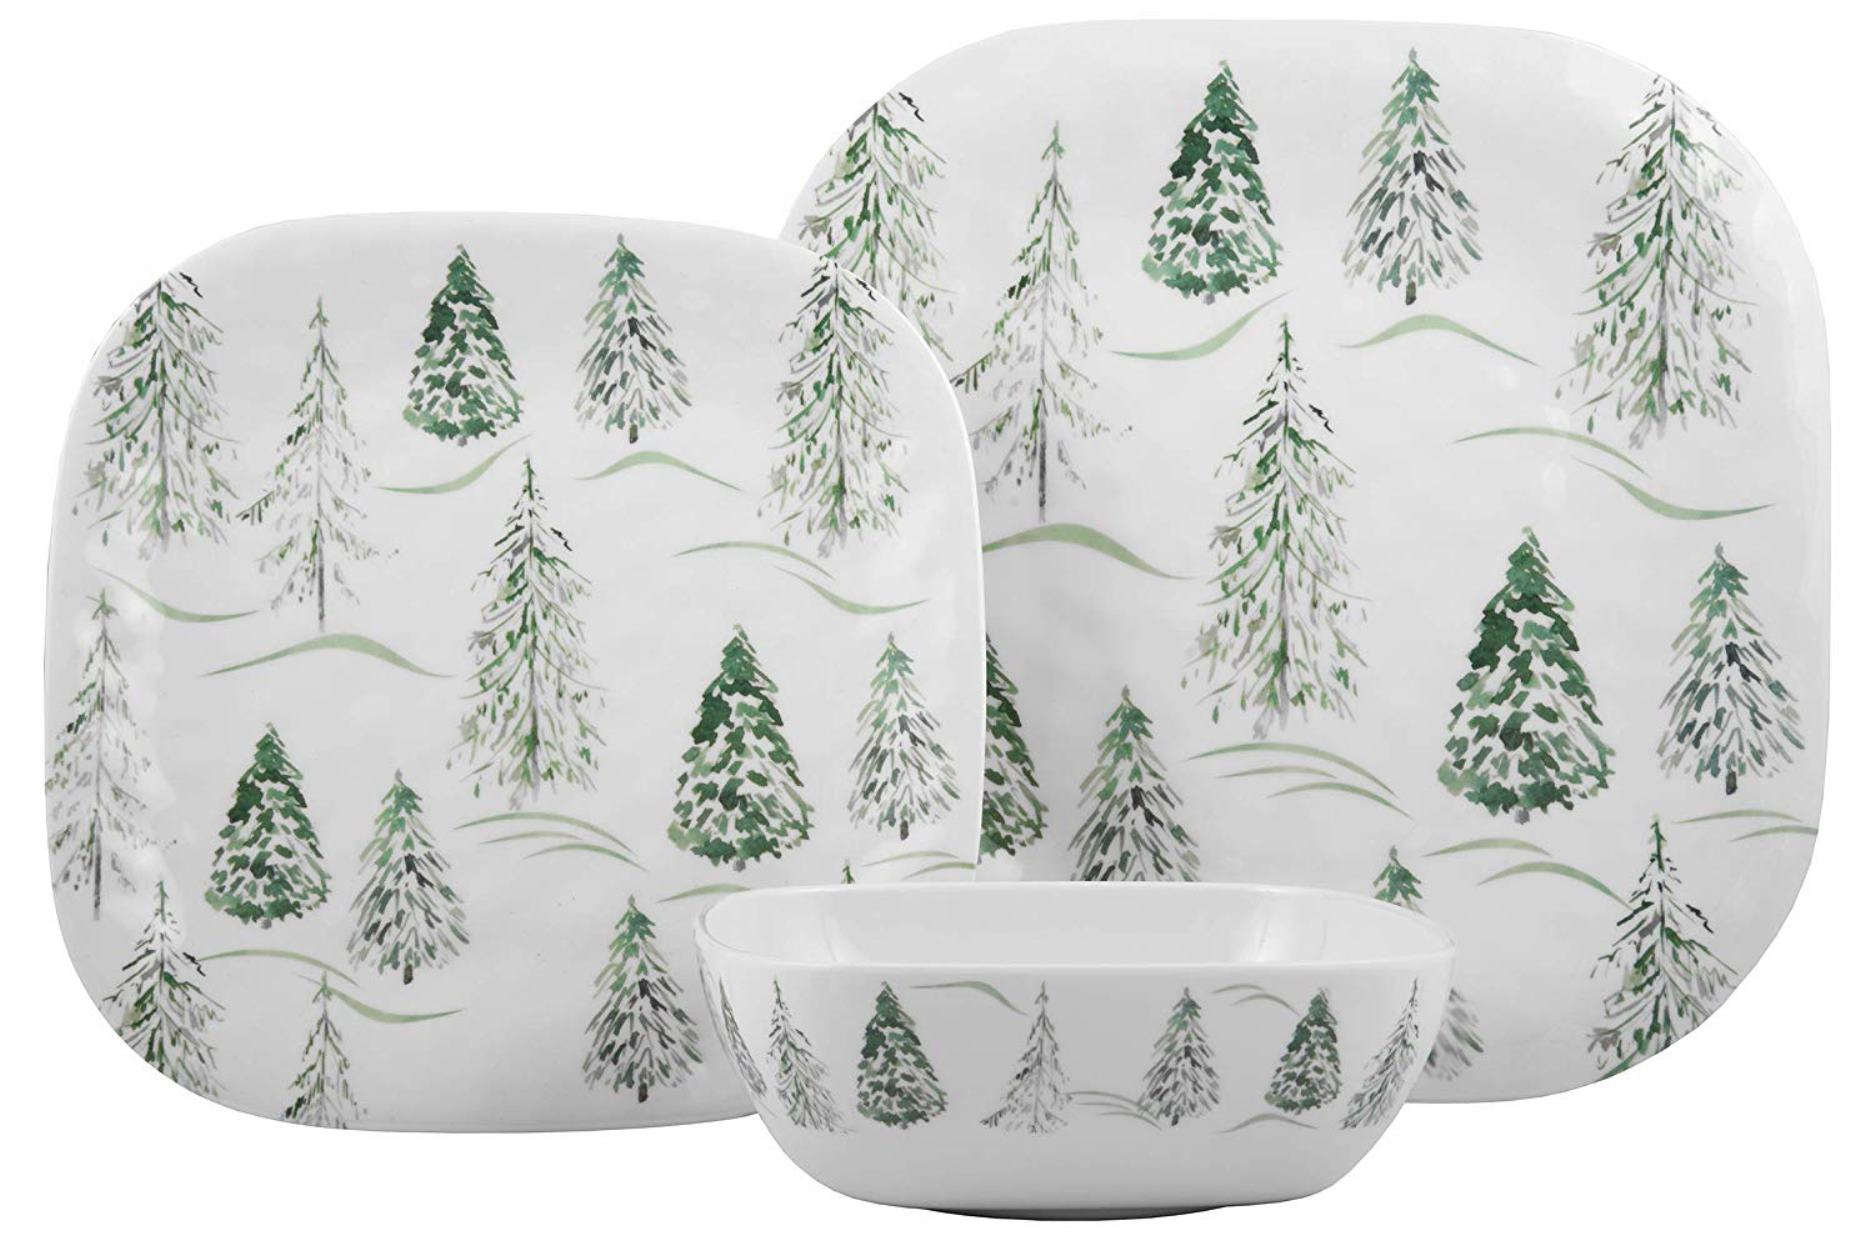 Melange 6-Piece 100/% Melamine Salad Plate Set Shatter-Proof and Chip-Resistant Melamine Salad Plates Christmas Tree Collection